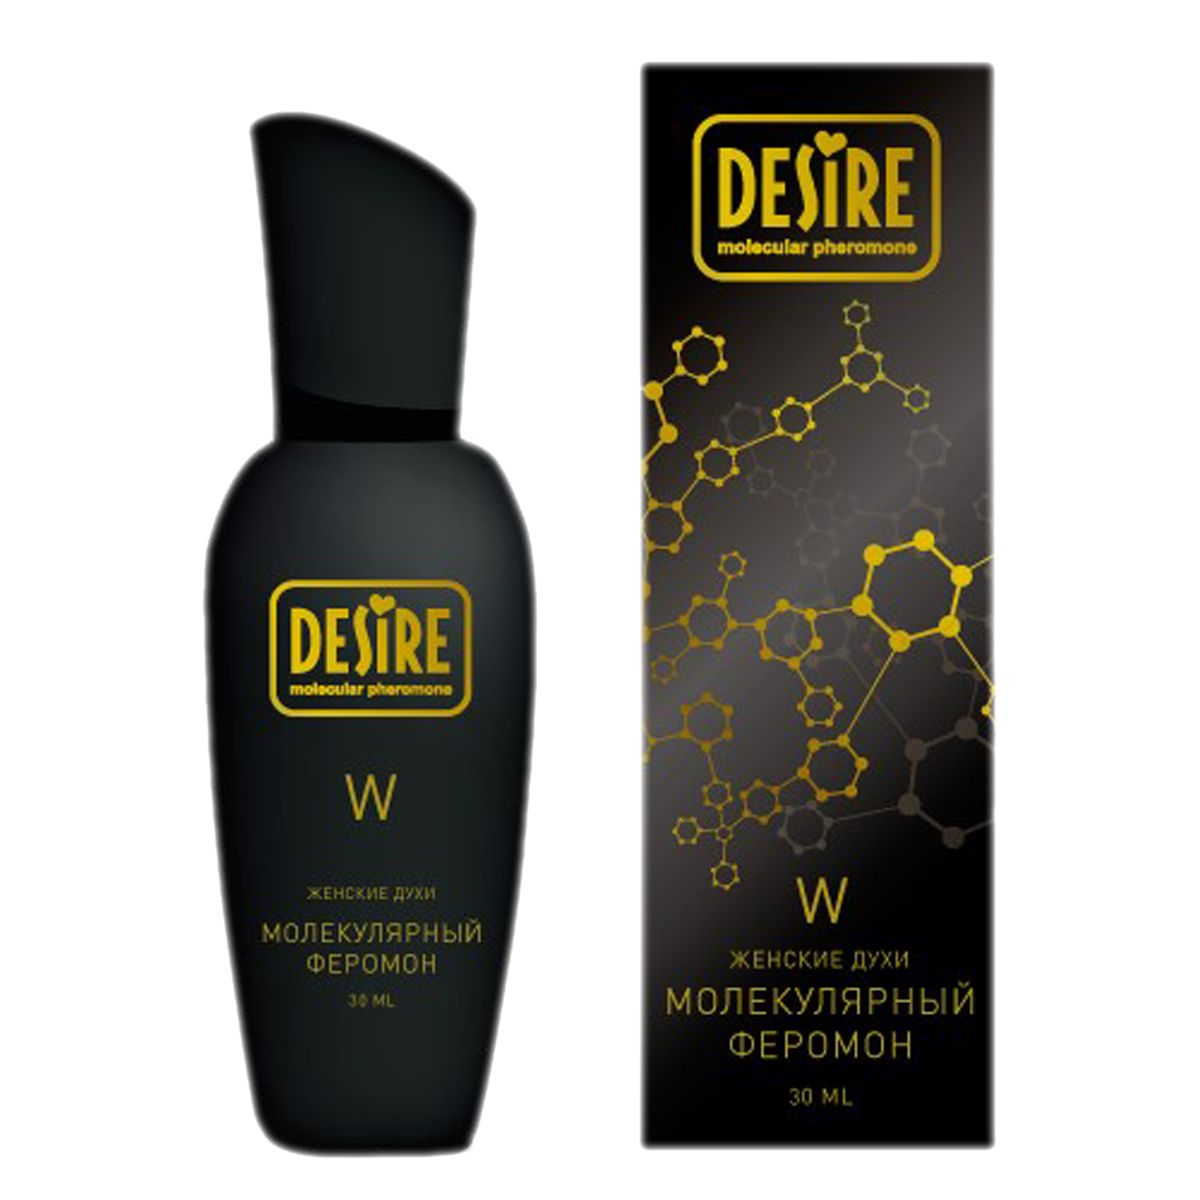 Женские духи «Молекулярный феромон» - 30 мл.-